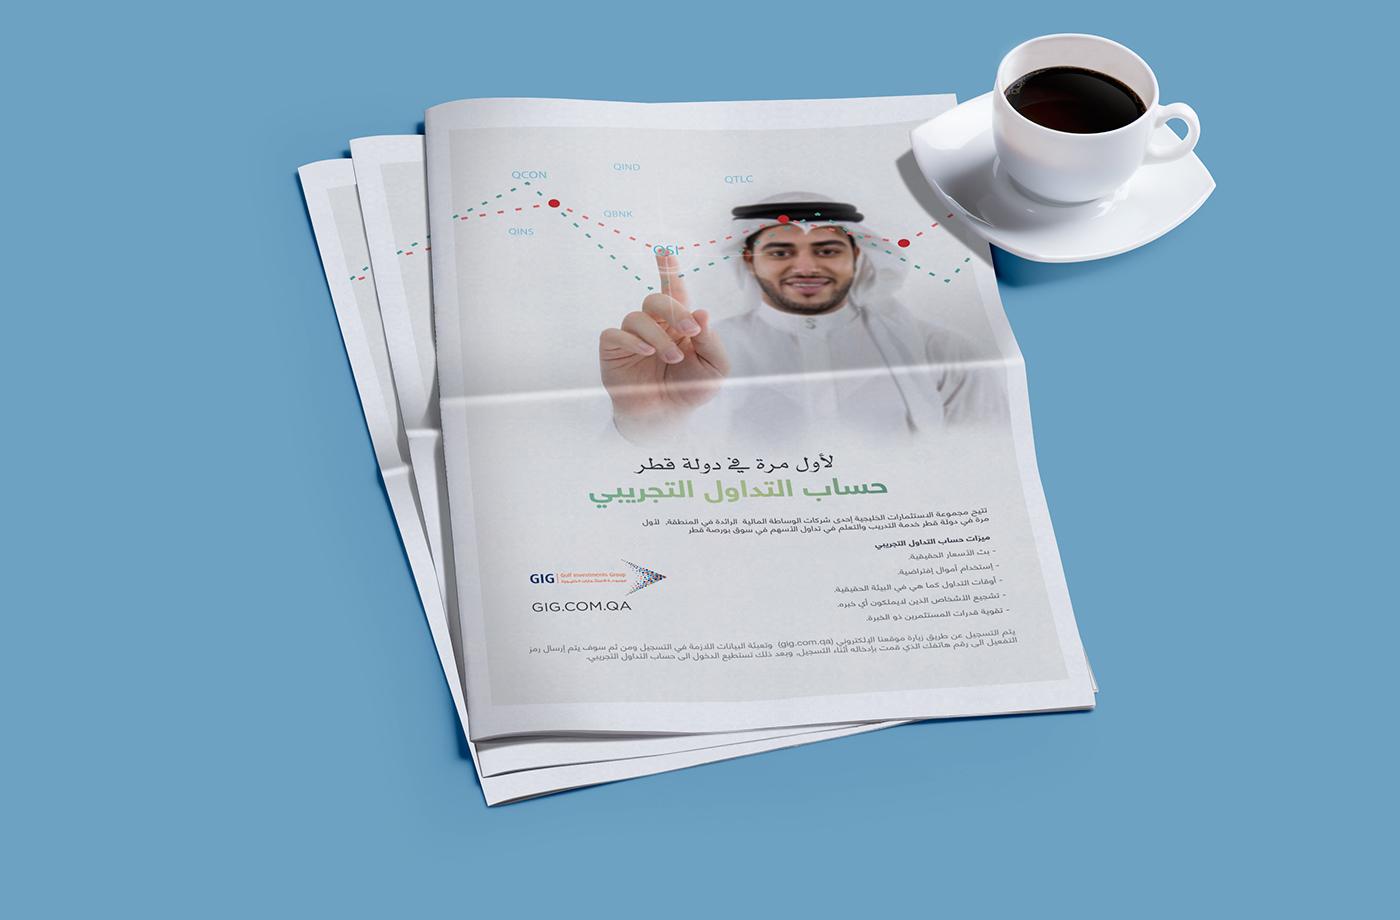 GIG Newspaper ad ad Saeed elgarf arabic